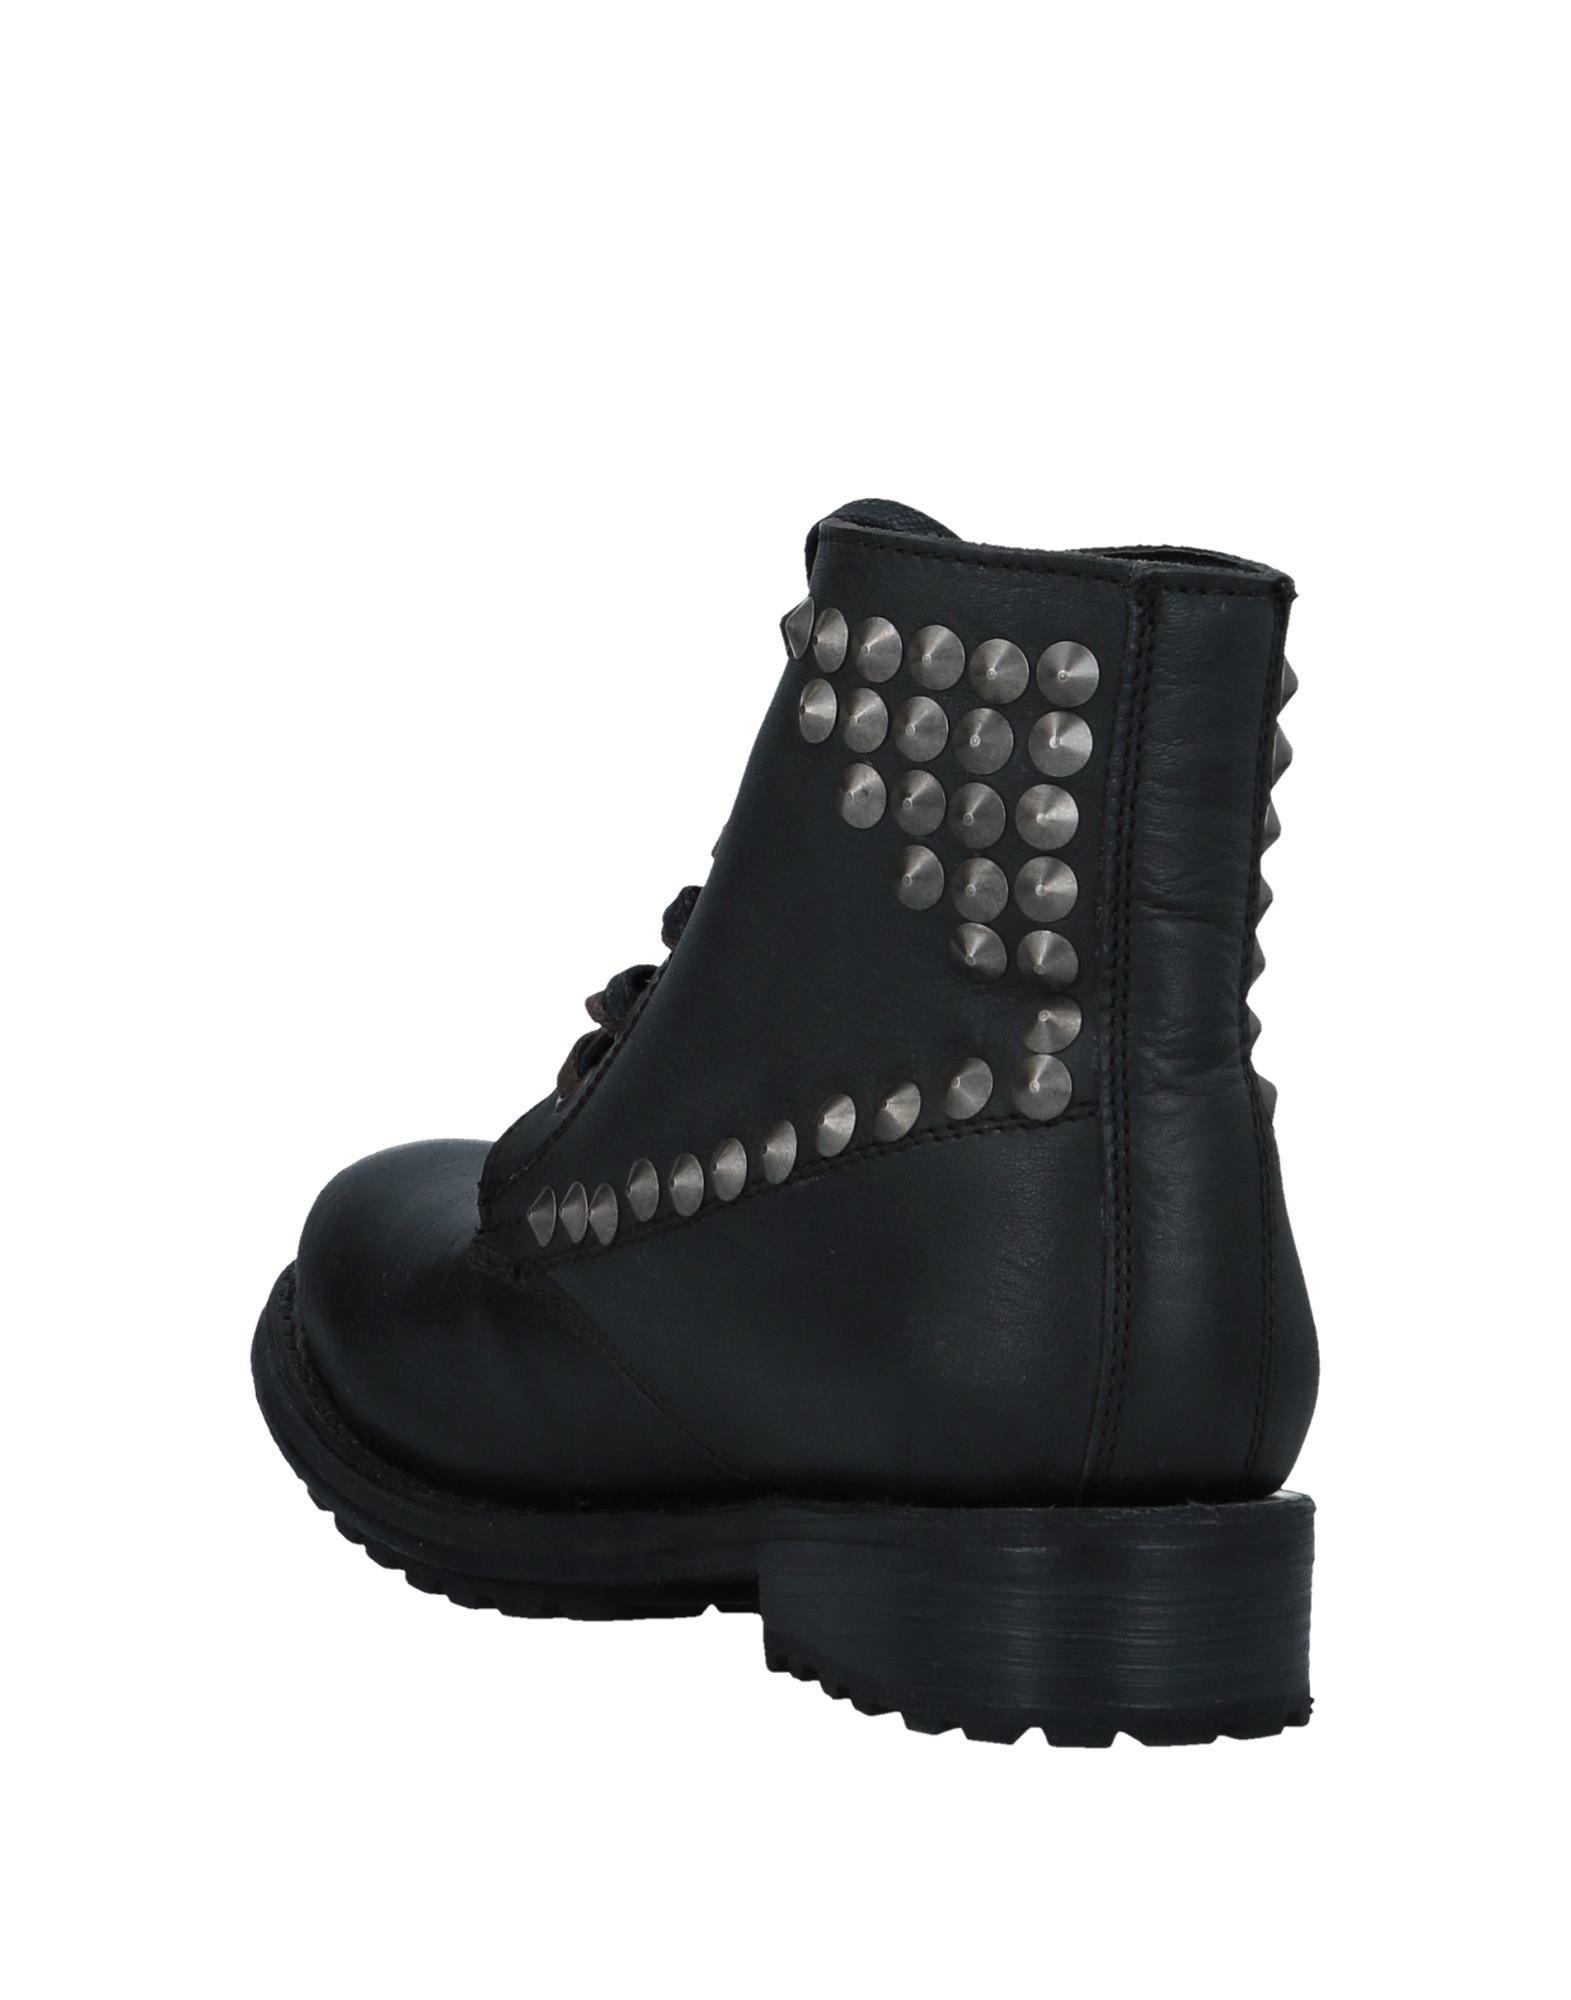 Ash Stiefelette strapazierfähige Damen  11531313GIGut aussehende strapazierfähige Stiefelette Schuhe f5e800